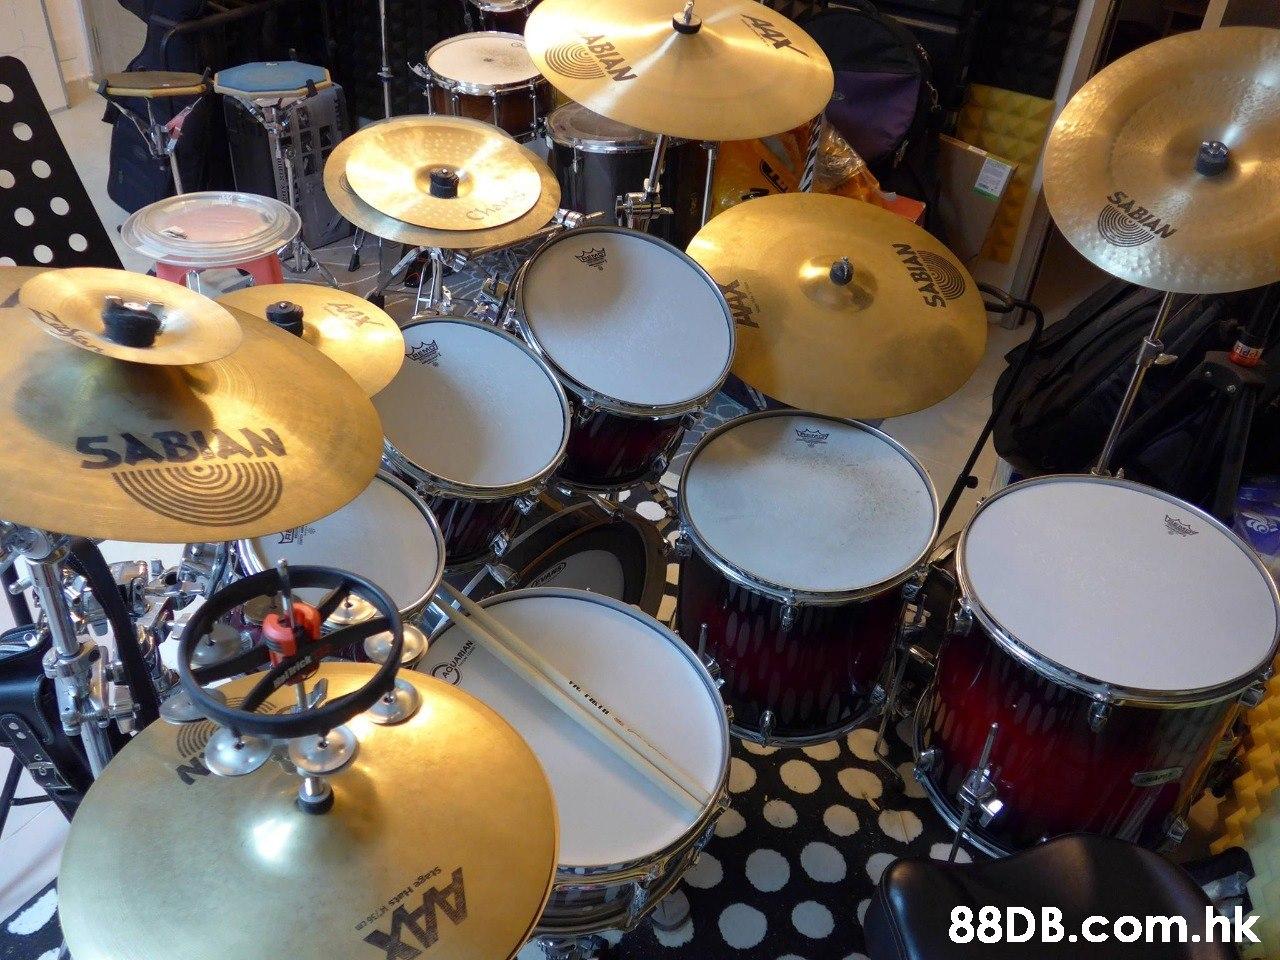 SABIAN SABIAN .hk A4X ABIAN AQUARIAN SABIAN  Drum,Musical instrument,Drums,Drumhead,Tom-tom drum